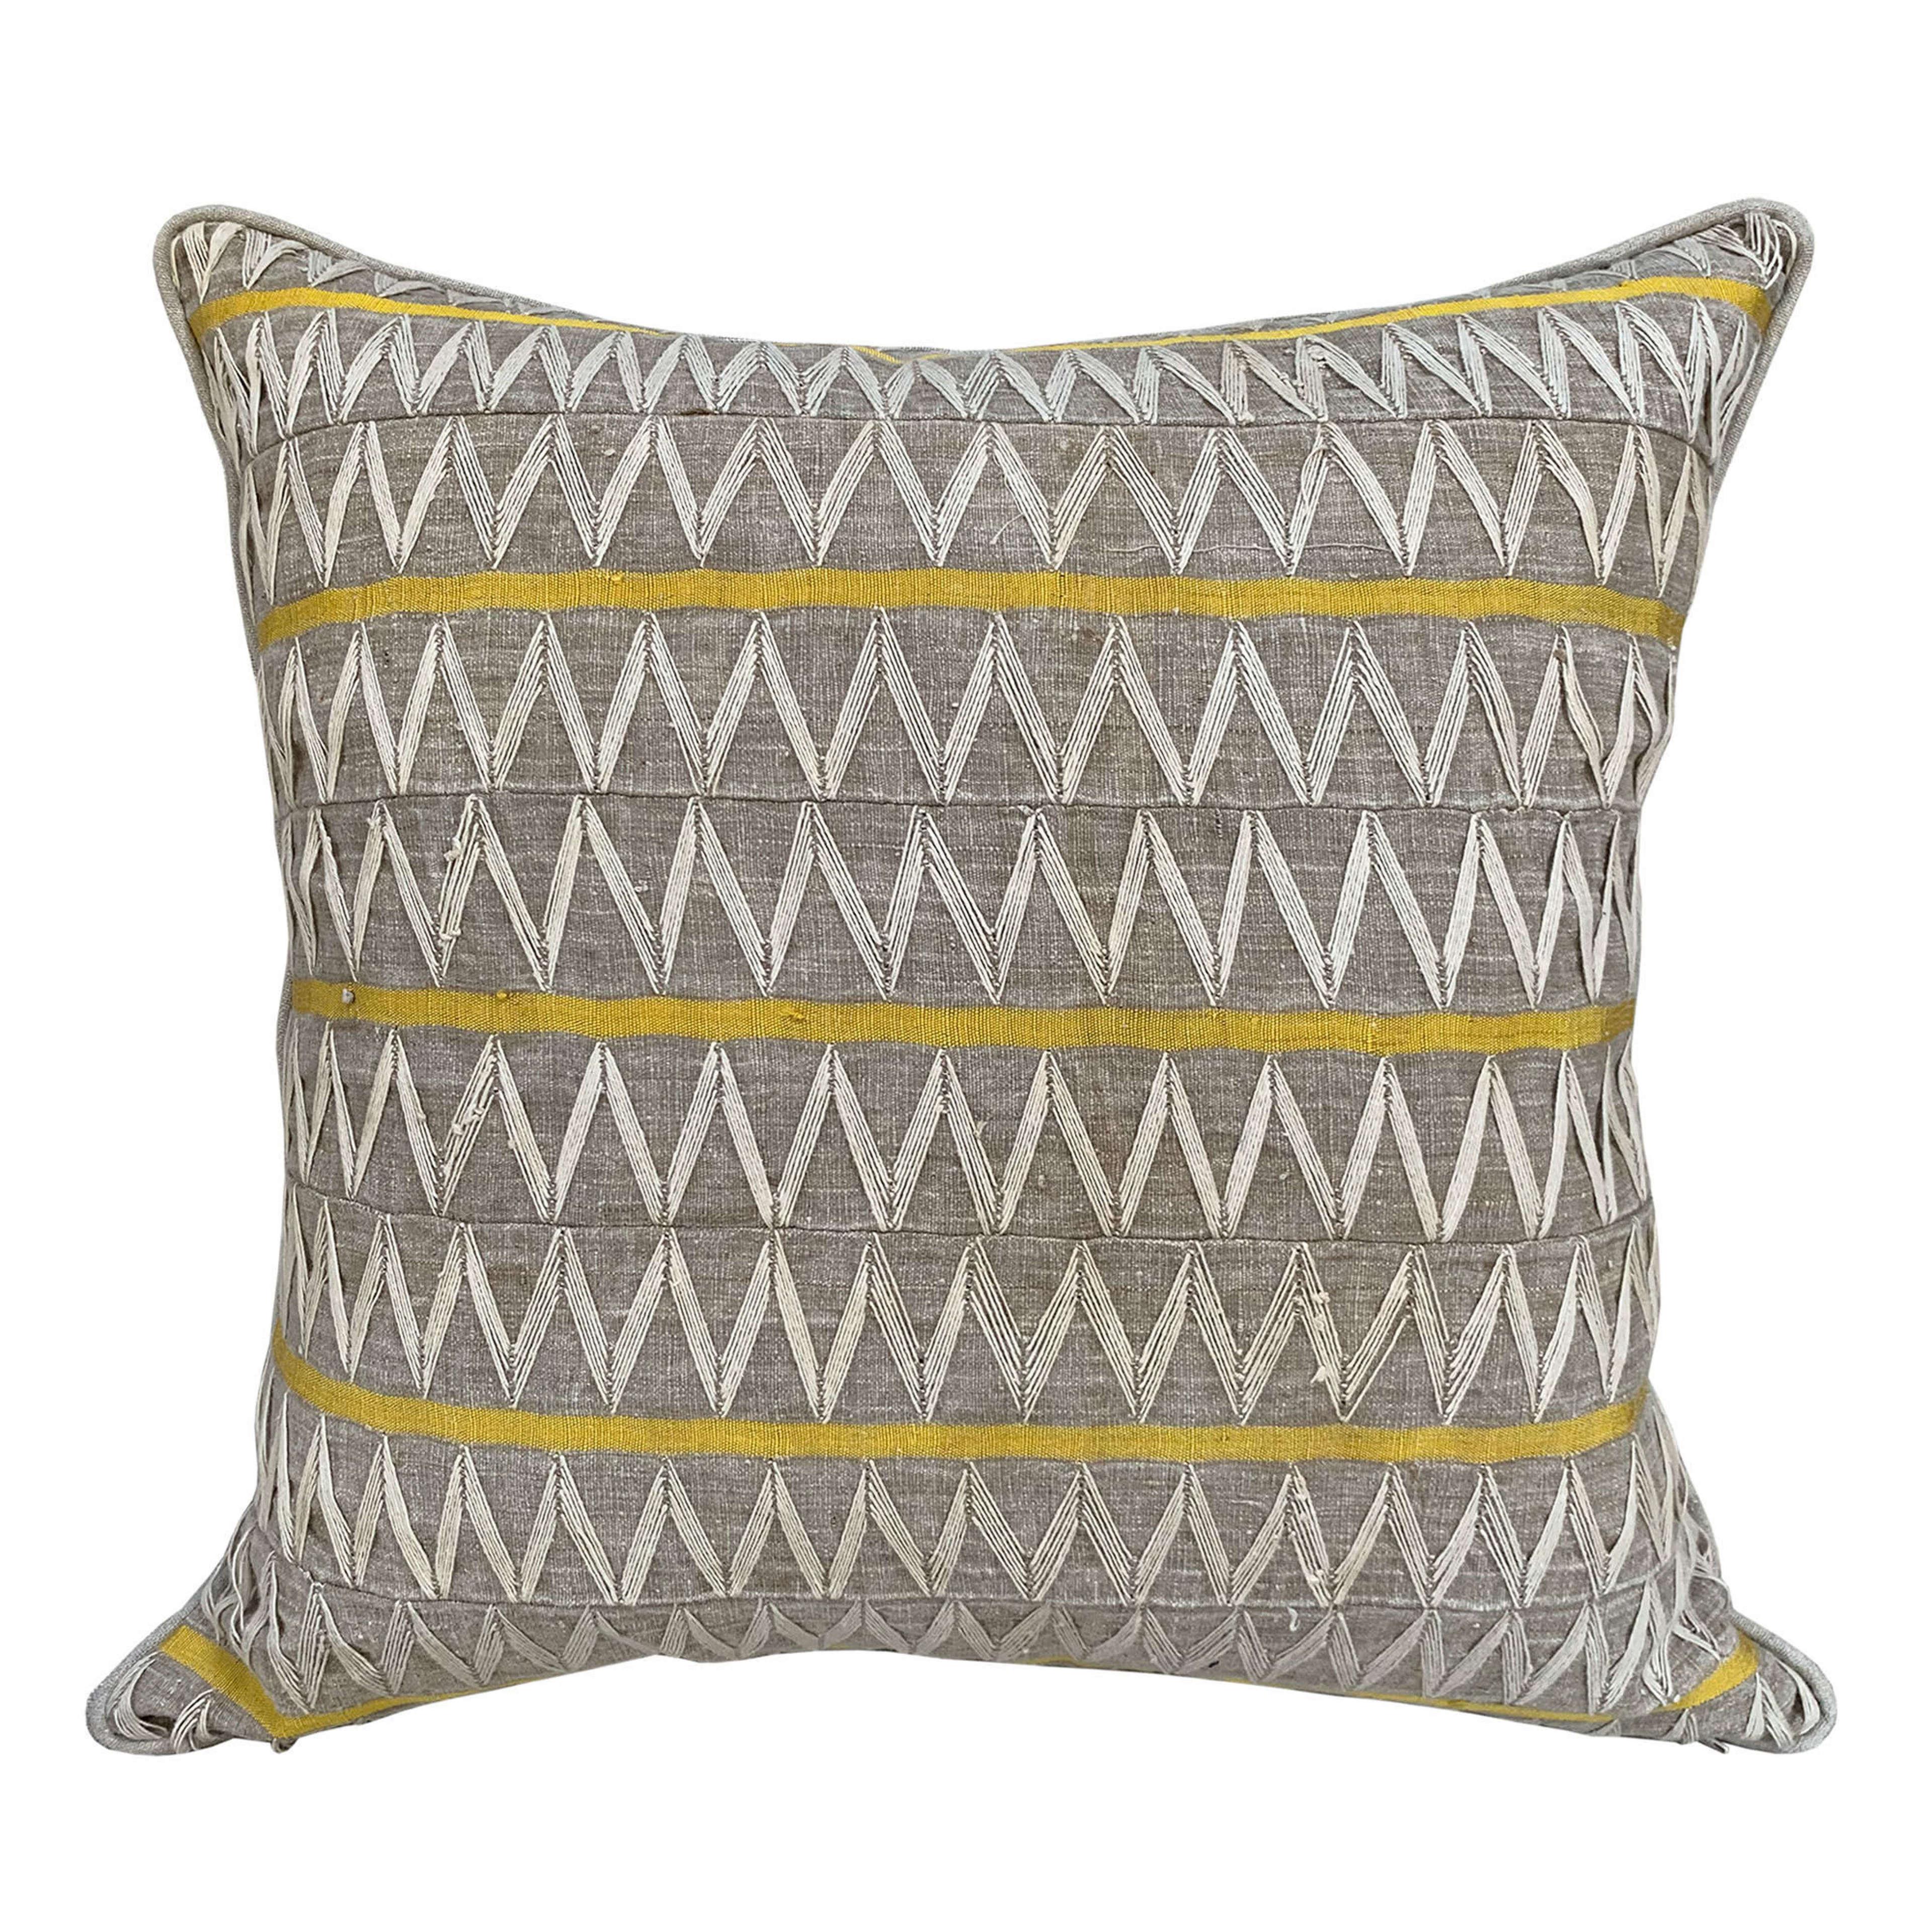 Yoruba Zig Zag cushions with yellow stripe